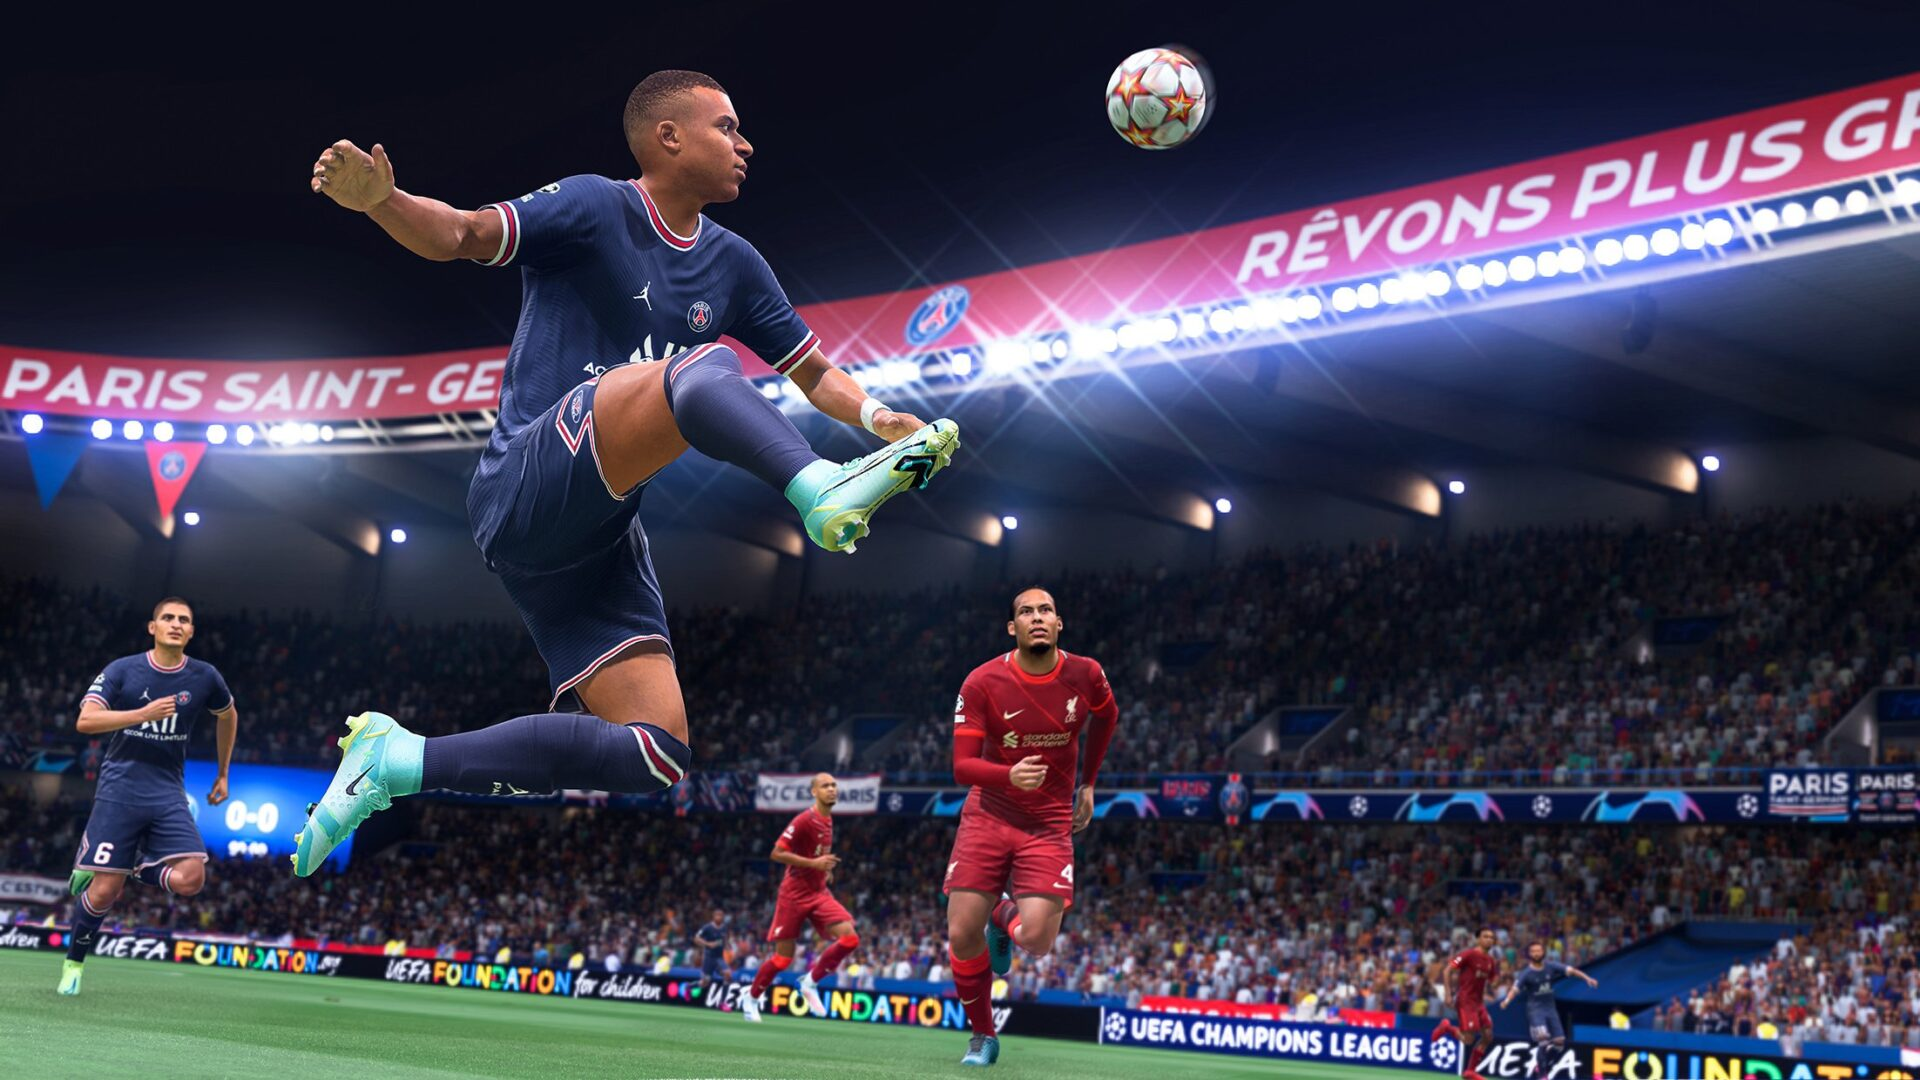 FIFA 22 rainbow flick